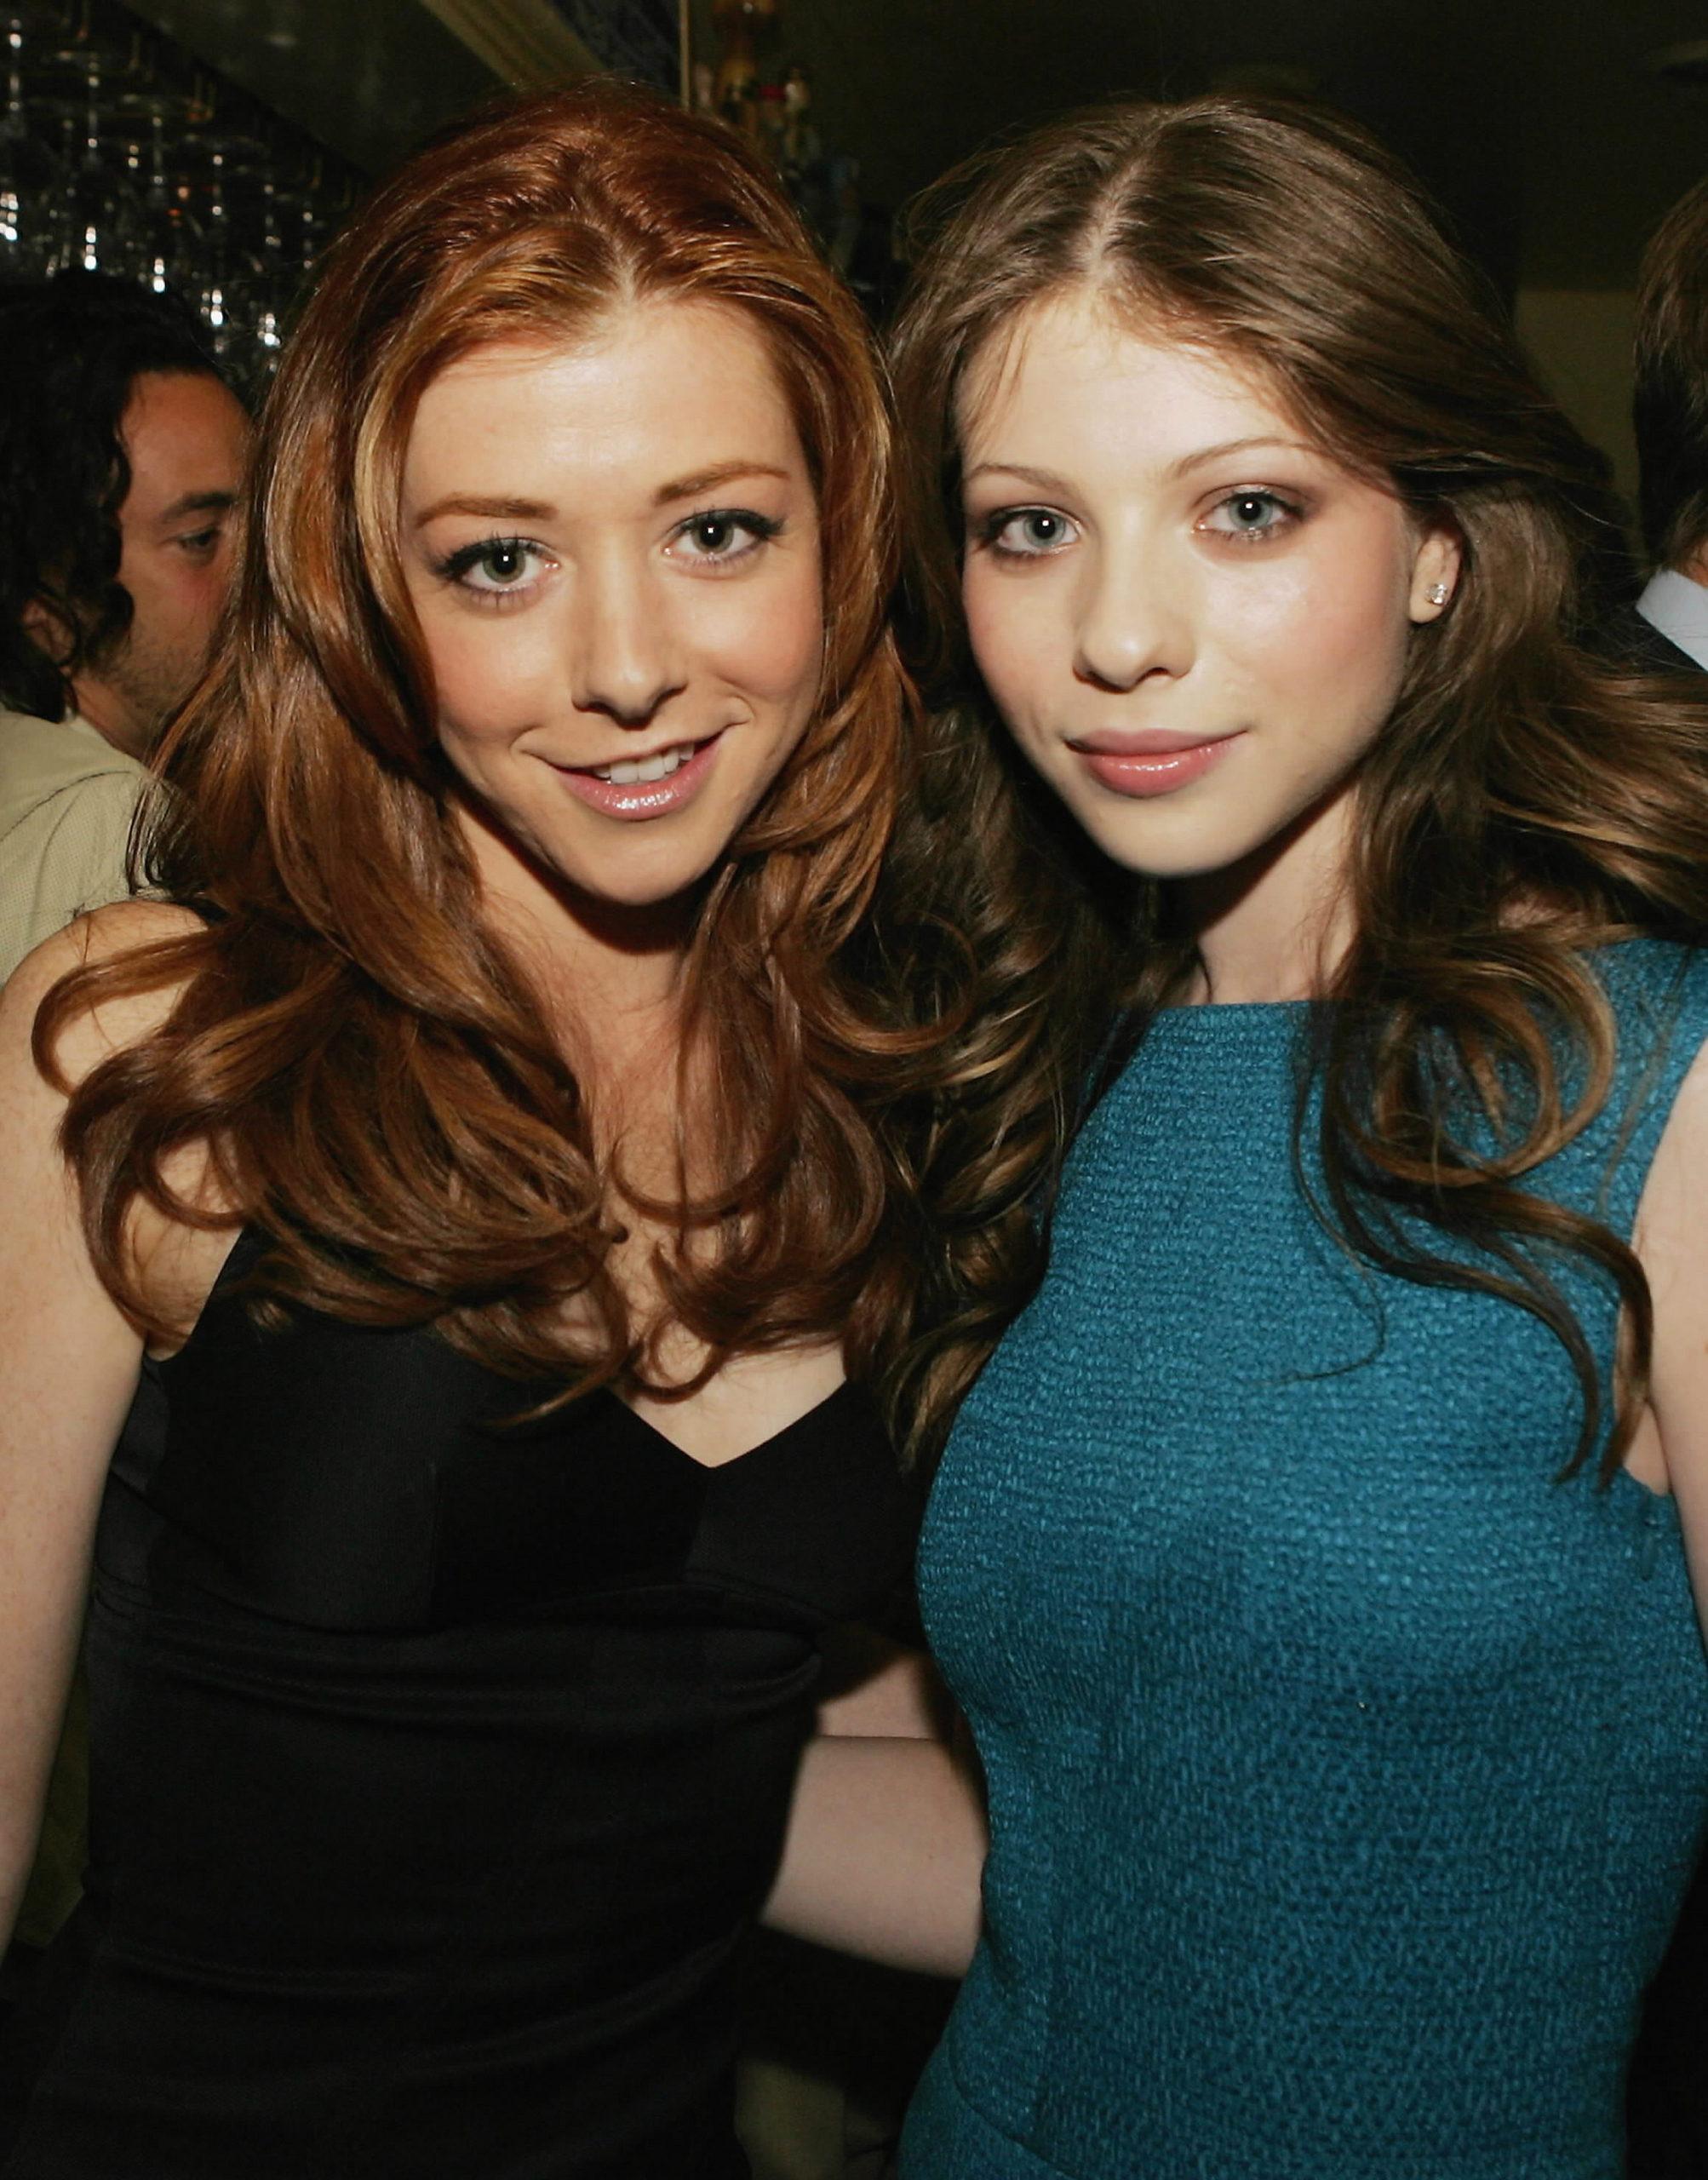 Aly & Michelle